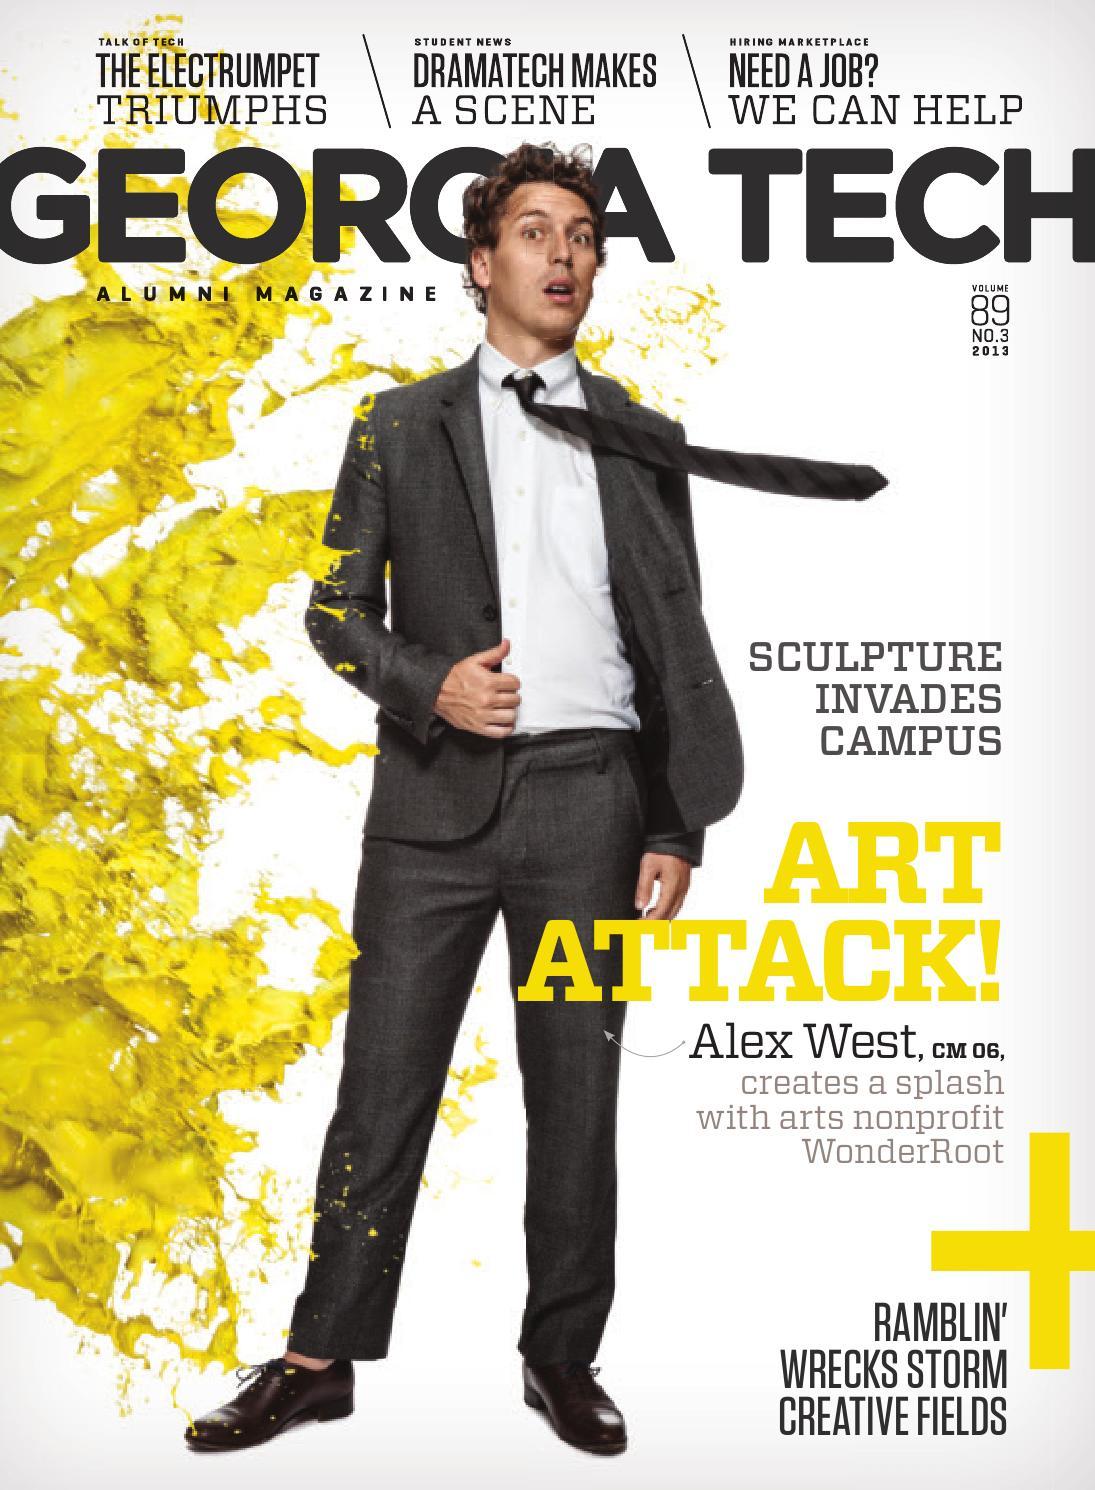 georgia tech alumni magazine vol 89, no 03 2013 by georgia tech